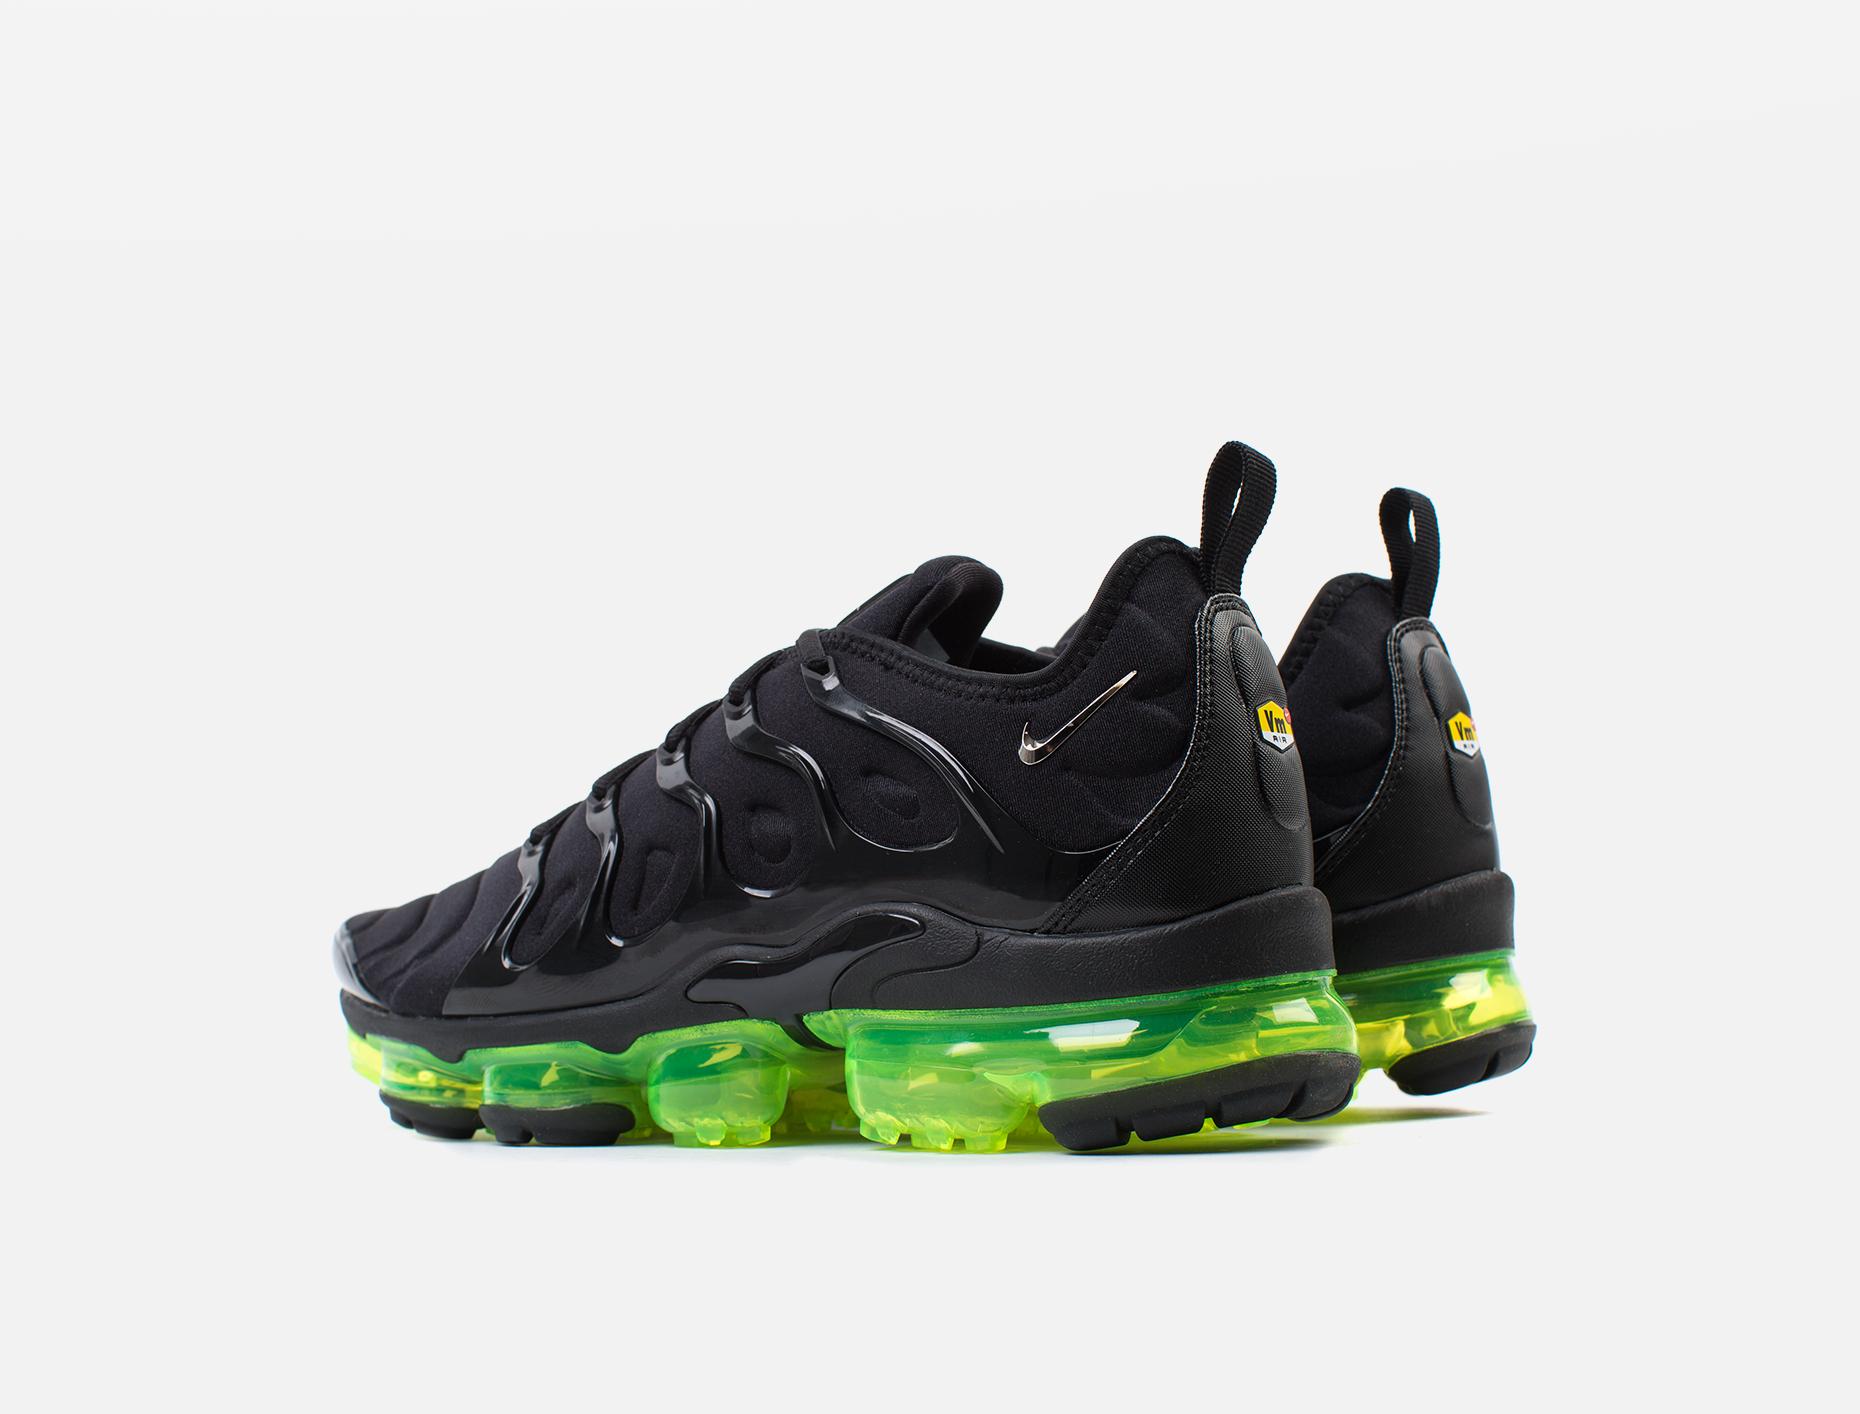 571982d281 Nike Air VaporMax Plus Sneaker   Voo Store Berlin   Worldwide Shipping